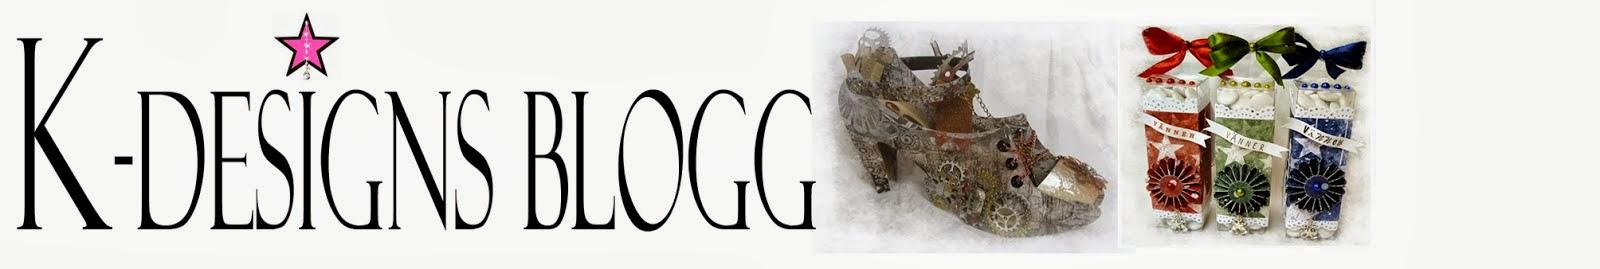 K-designs Blog